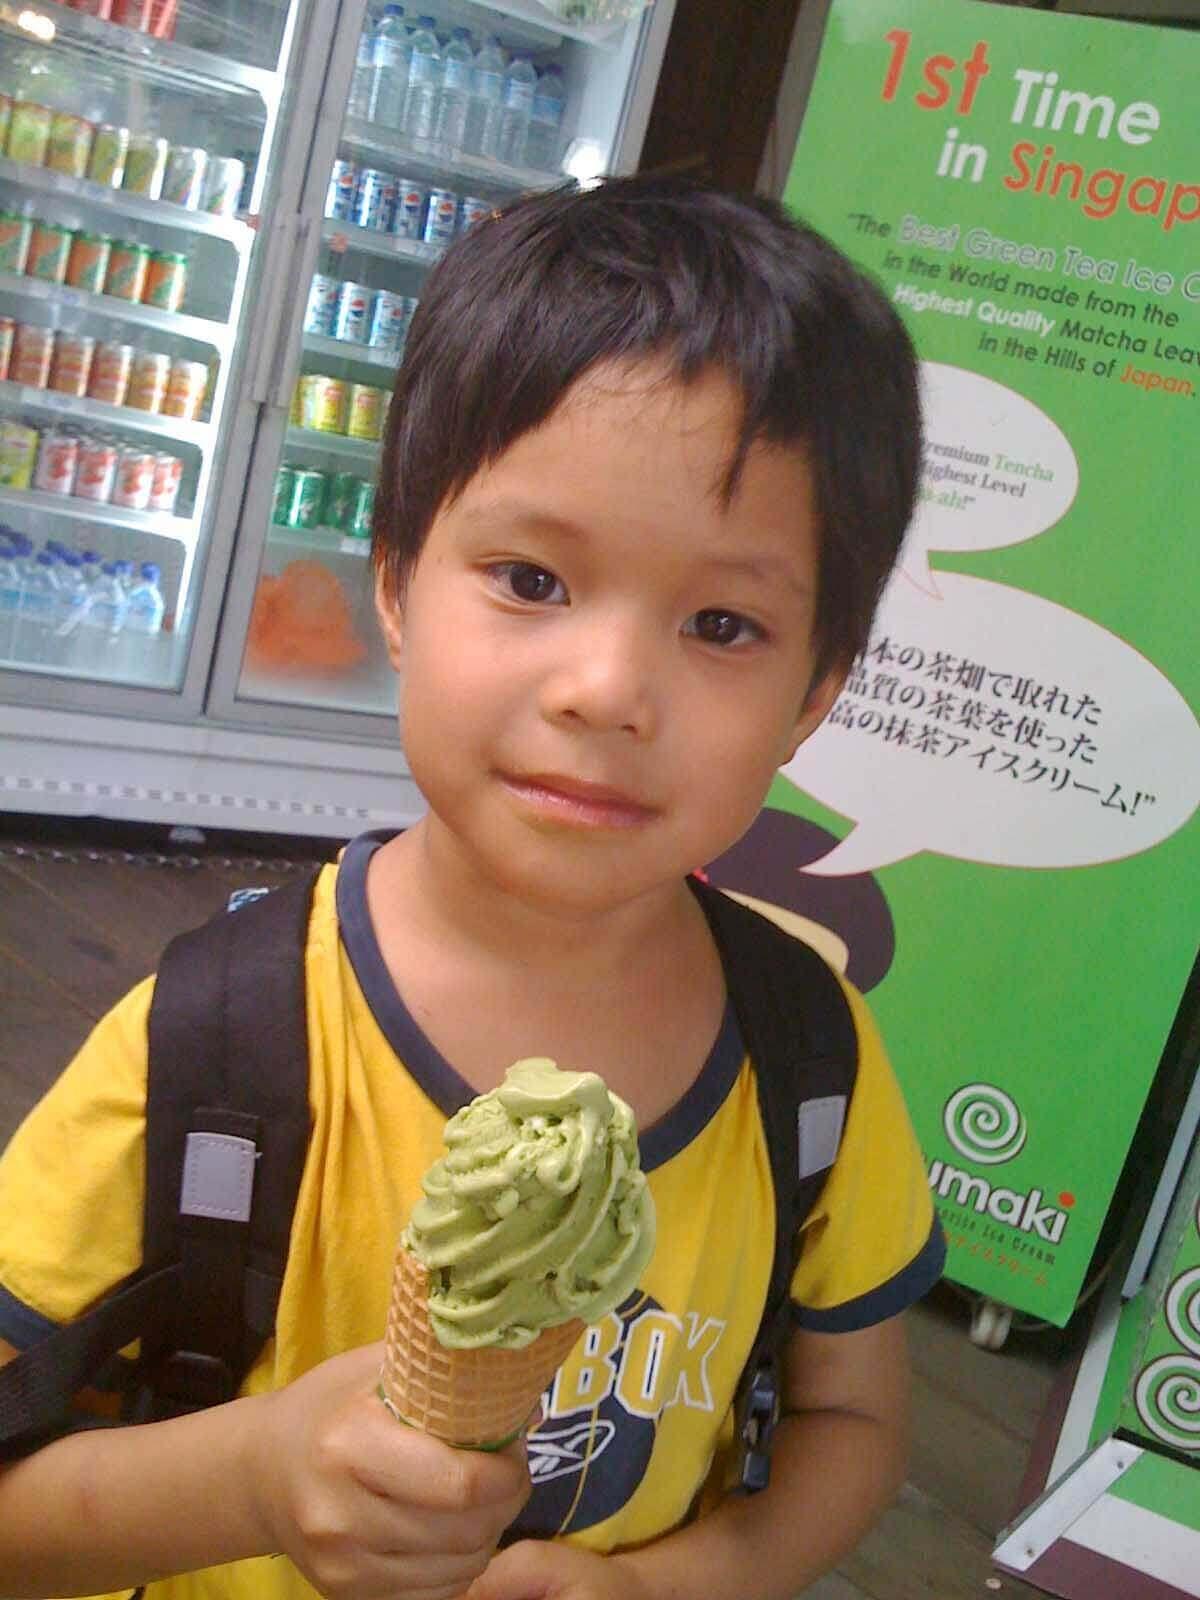 Uzumaki Ice Cream, matcha ice cream